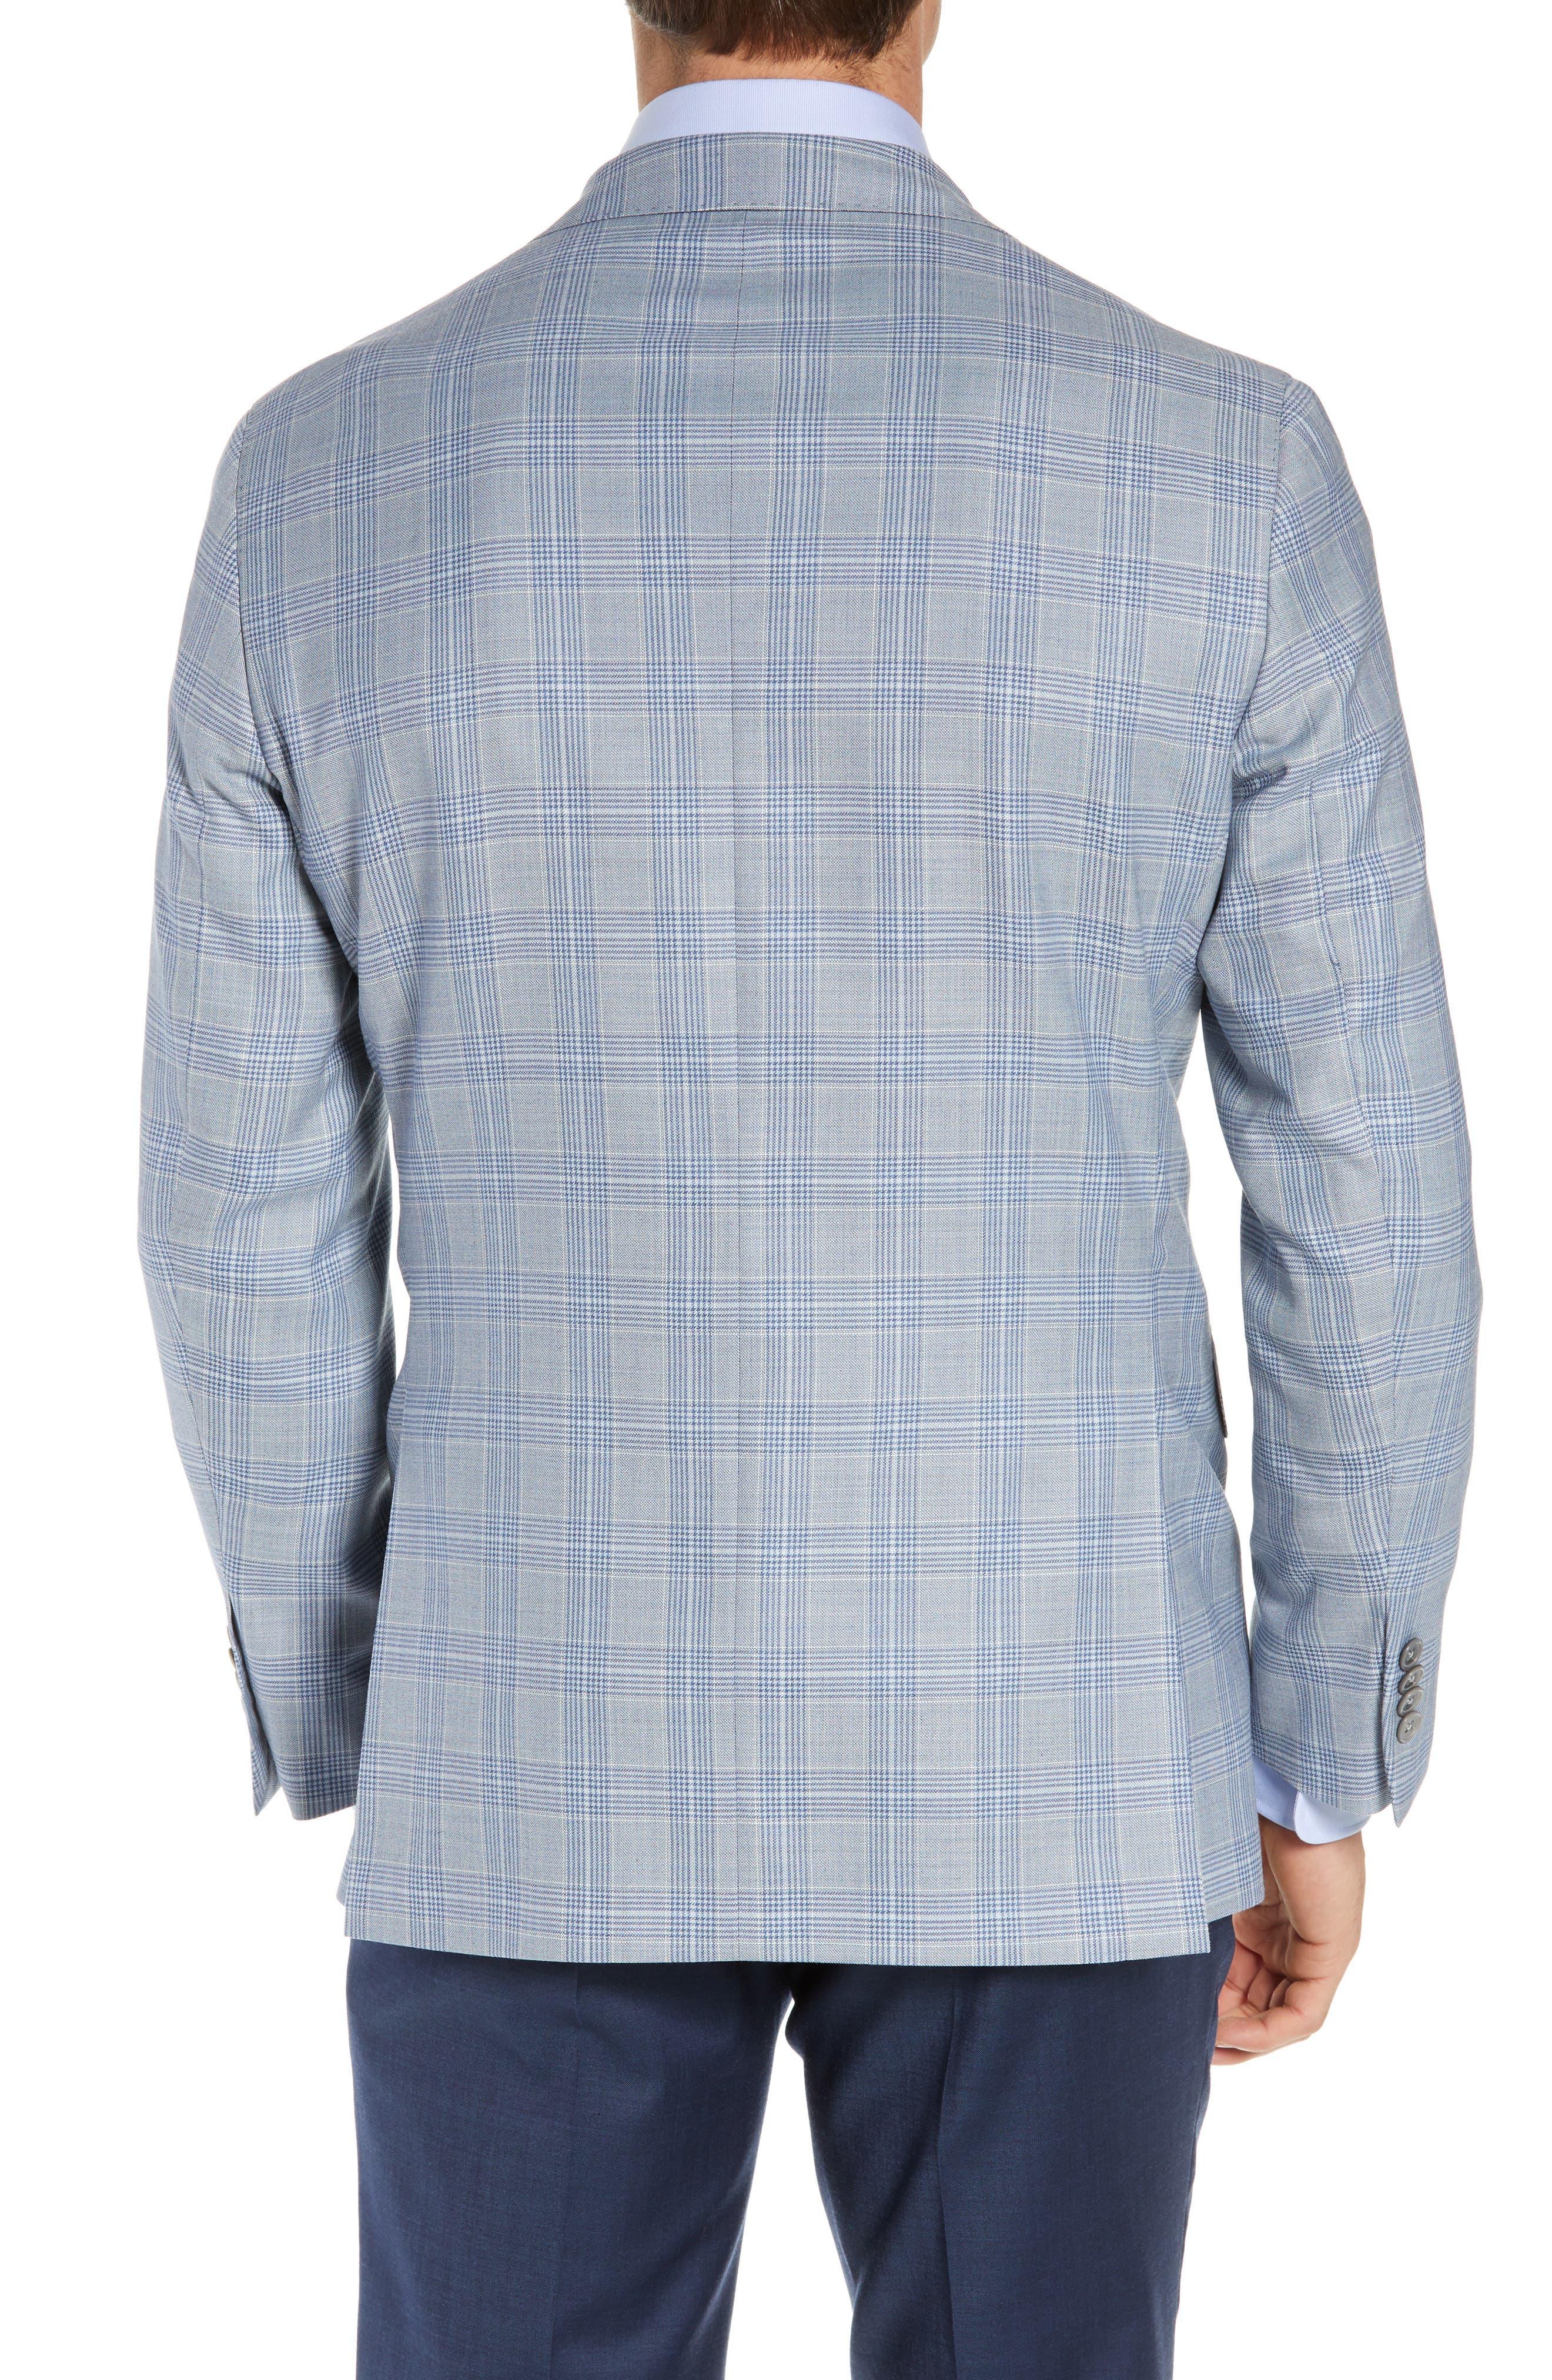 DAVID DONAHUE, Arnold Classic Fit Plaid Wool Sport Coat, Alternate thumbnail 2, color, BLUE